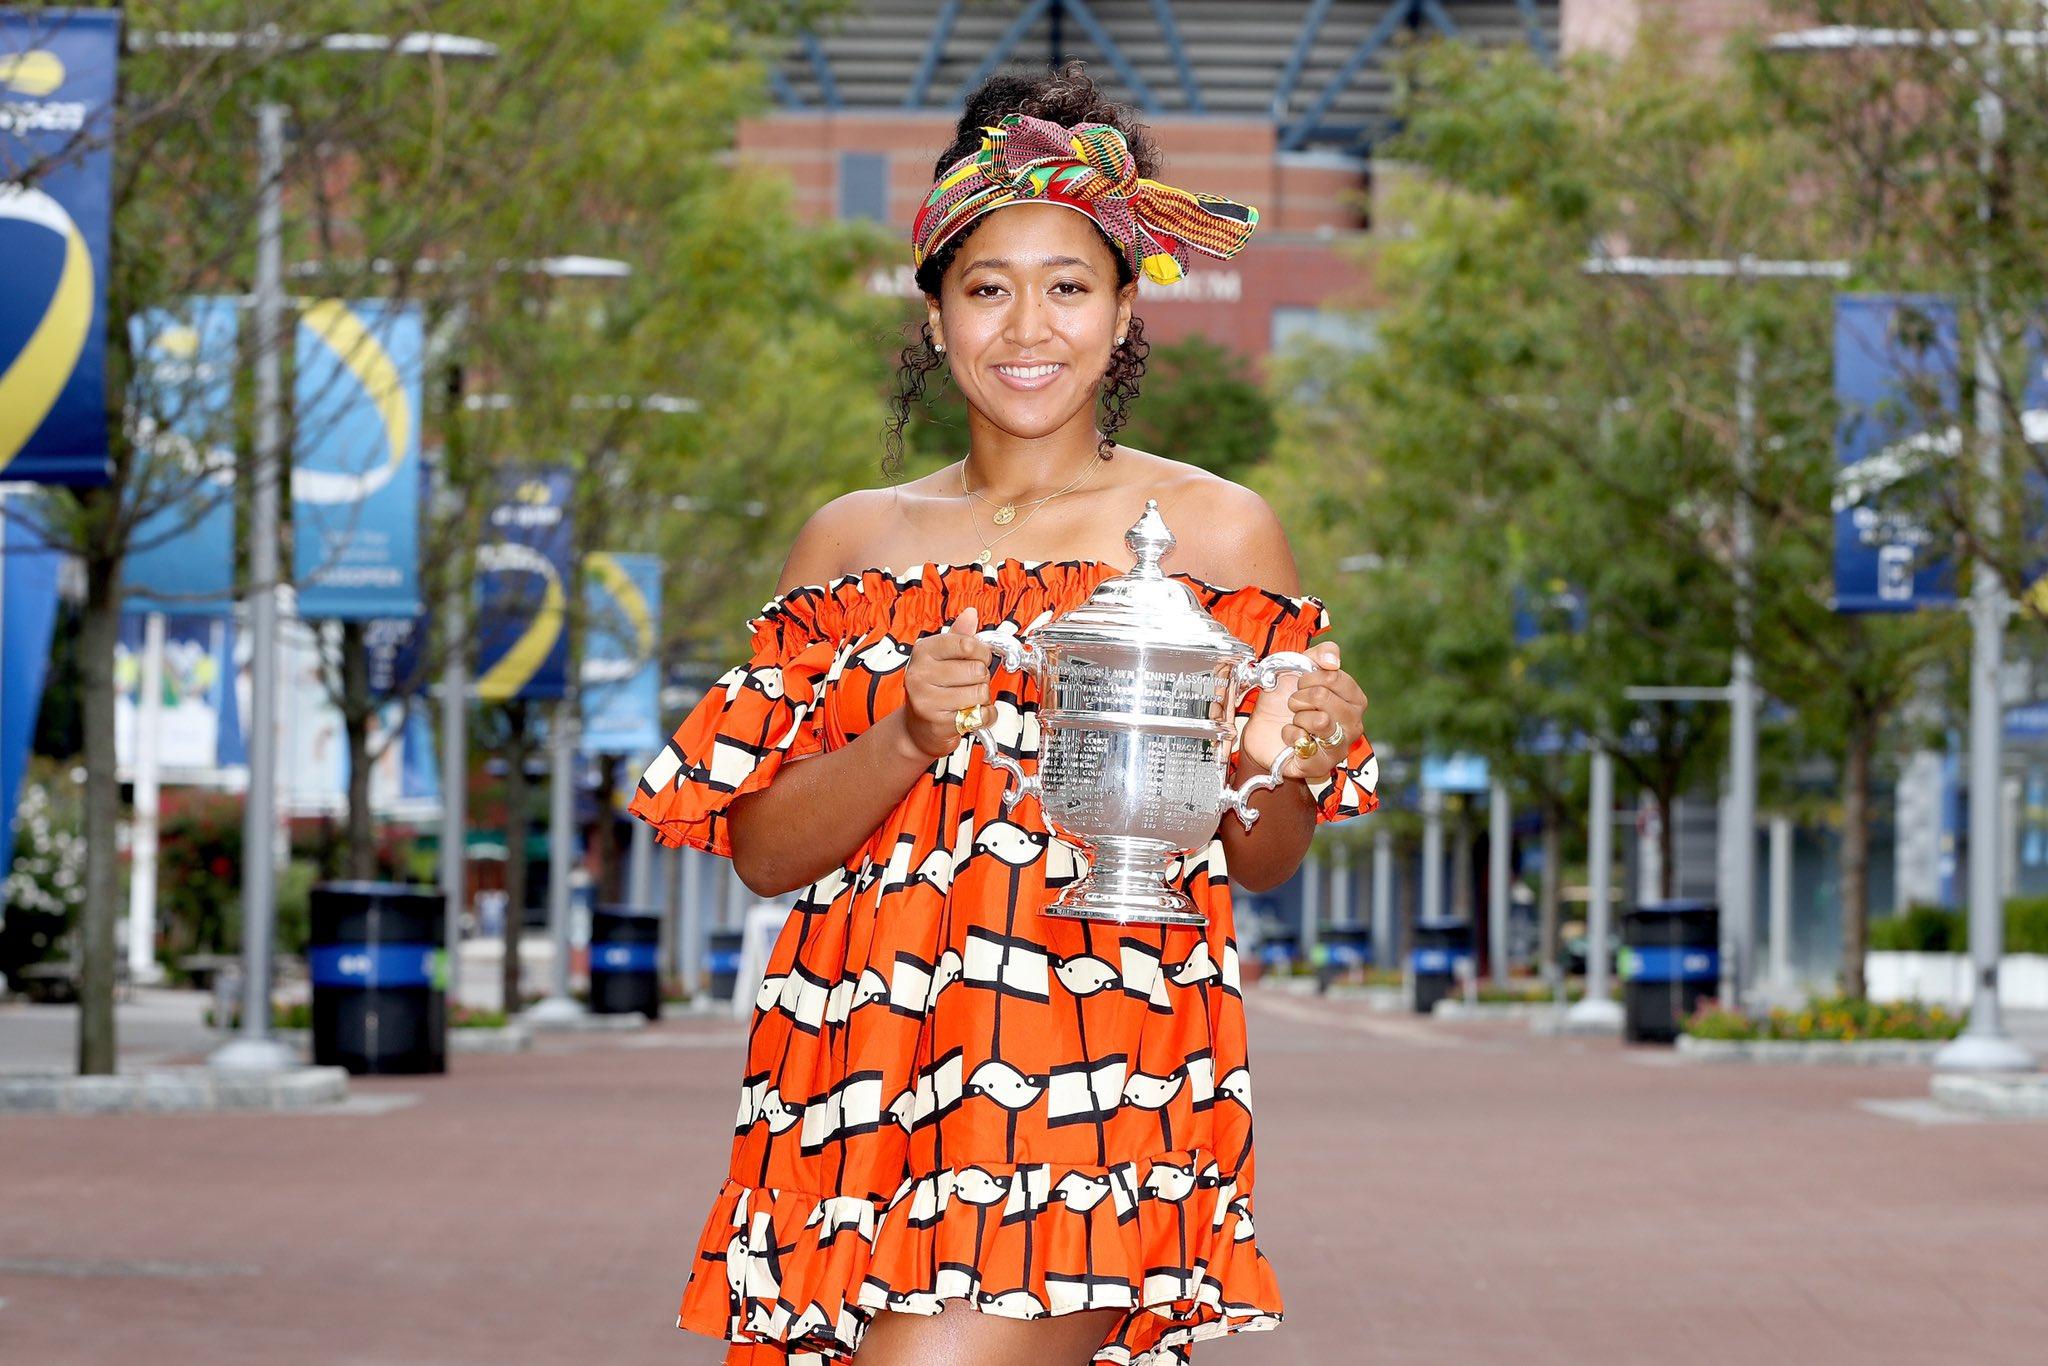 Naomi Osaka defeated Victoria Azarenka in the US Open 2020 women's final match